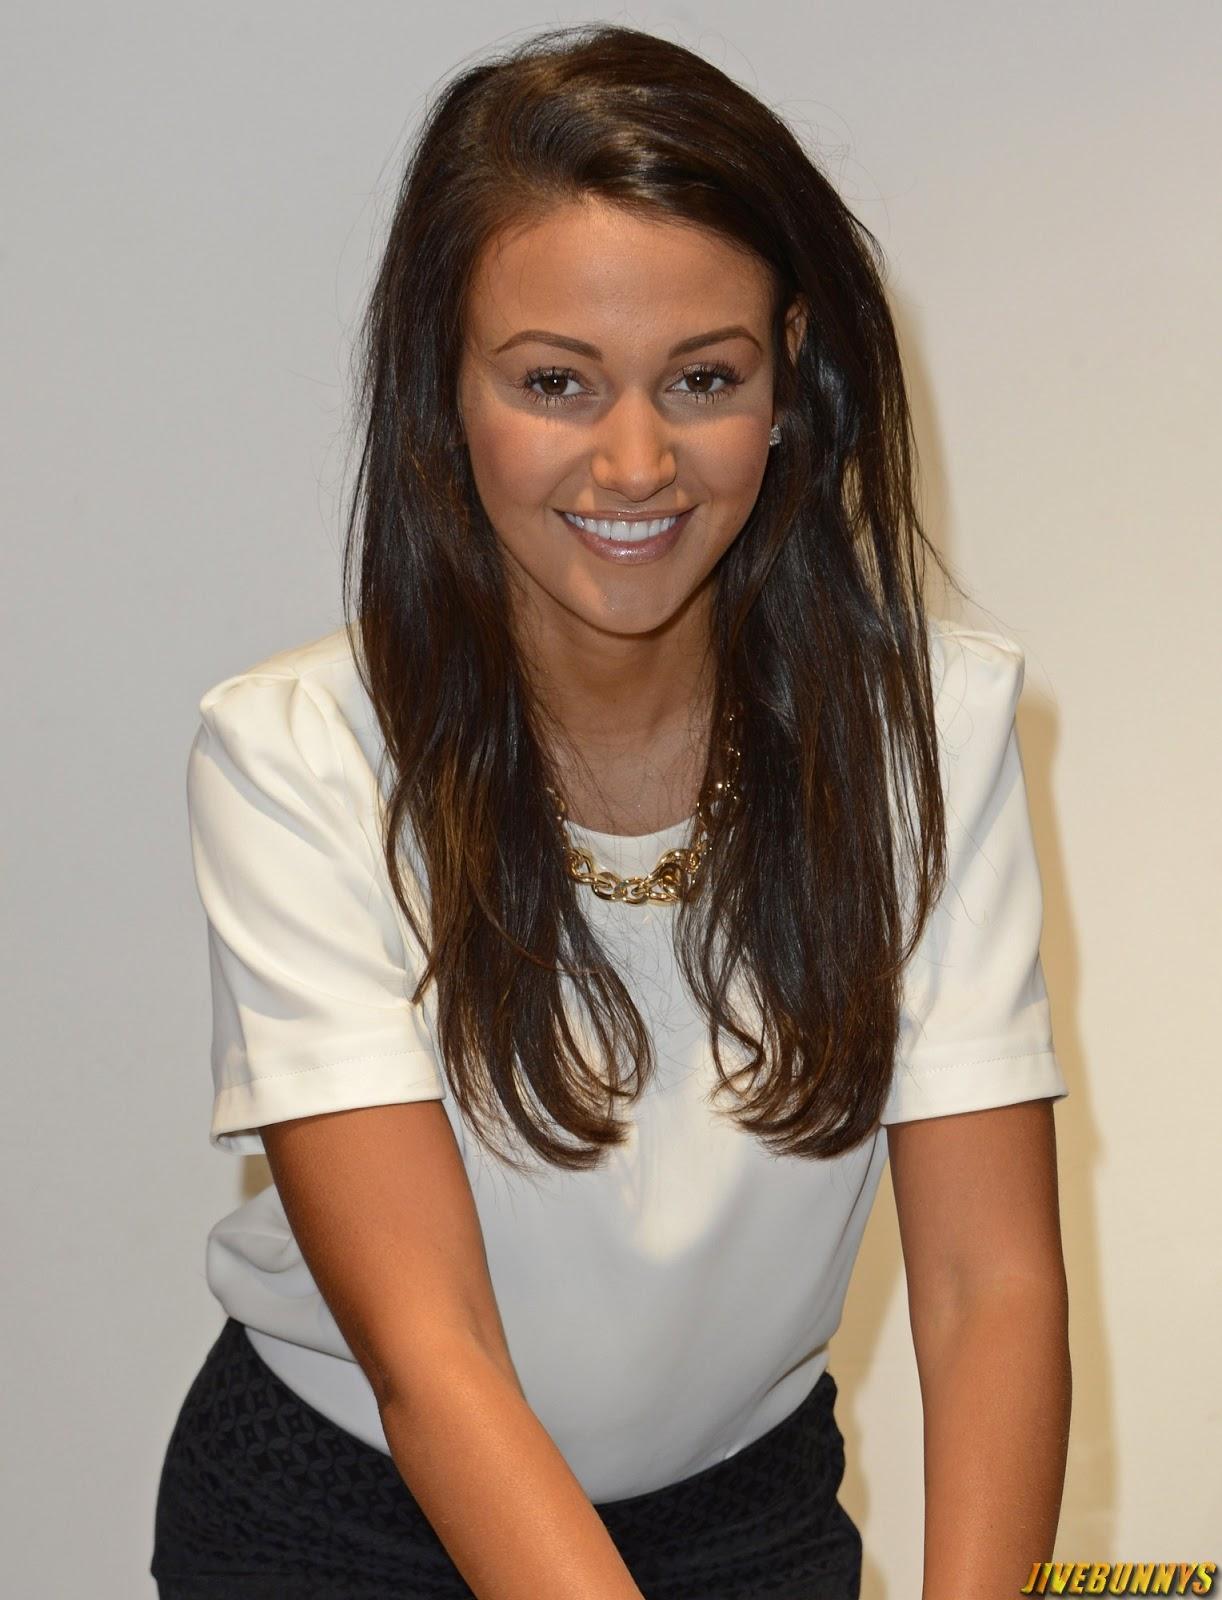 Jivebunnys Female Celebrity Picture Gallery: Michelle Keegan Hot ...